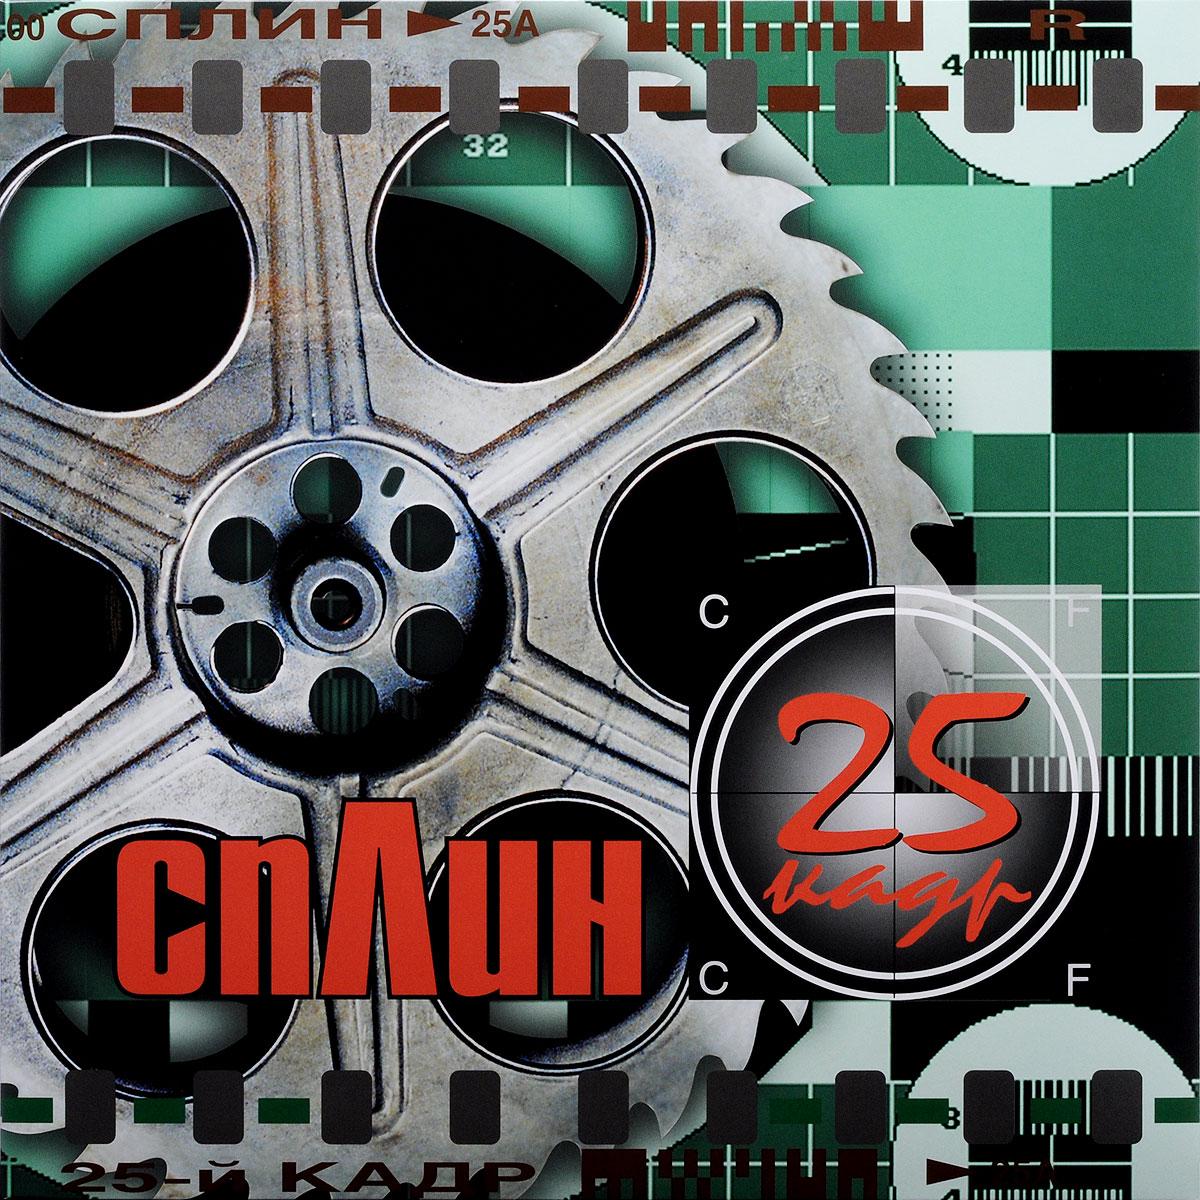 LP 1:Tracks 1-7LP 2:Tracks 8-13